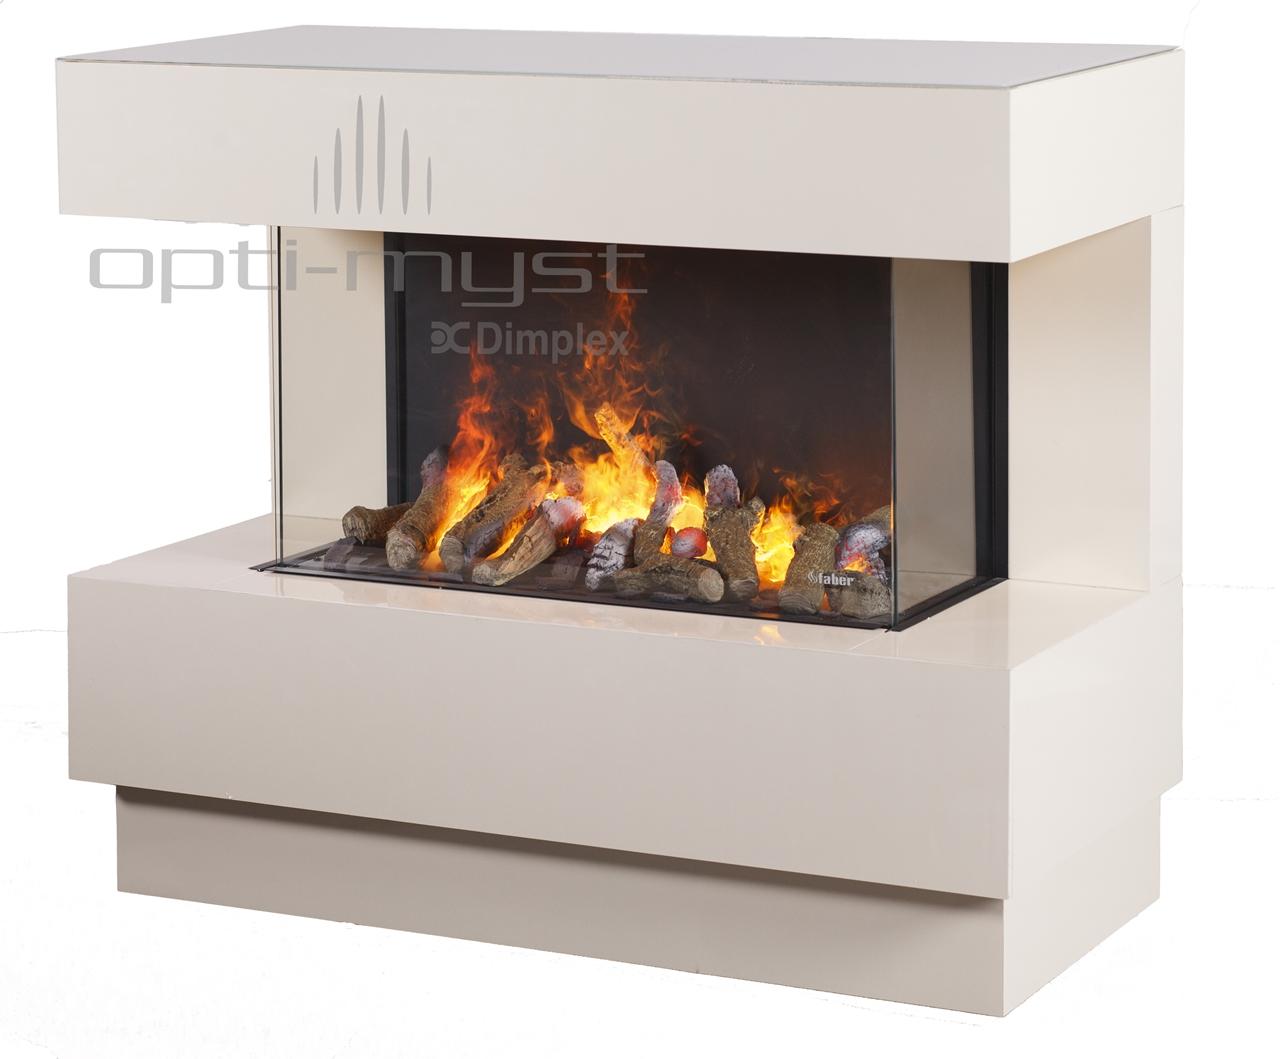 cheminee electrique dimplex bingham. Black Bedroom Furniture Sets. Home Design Ideas